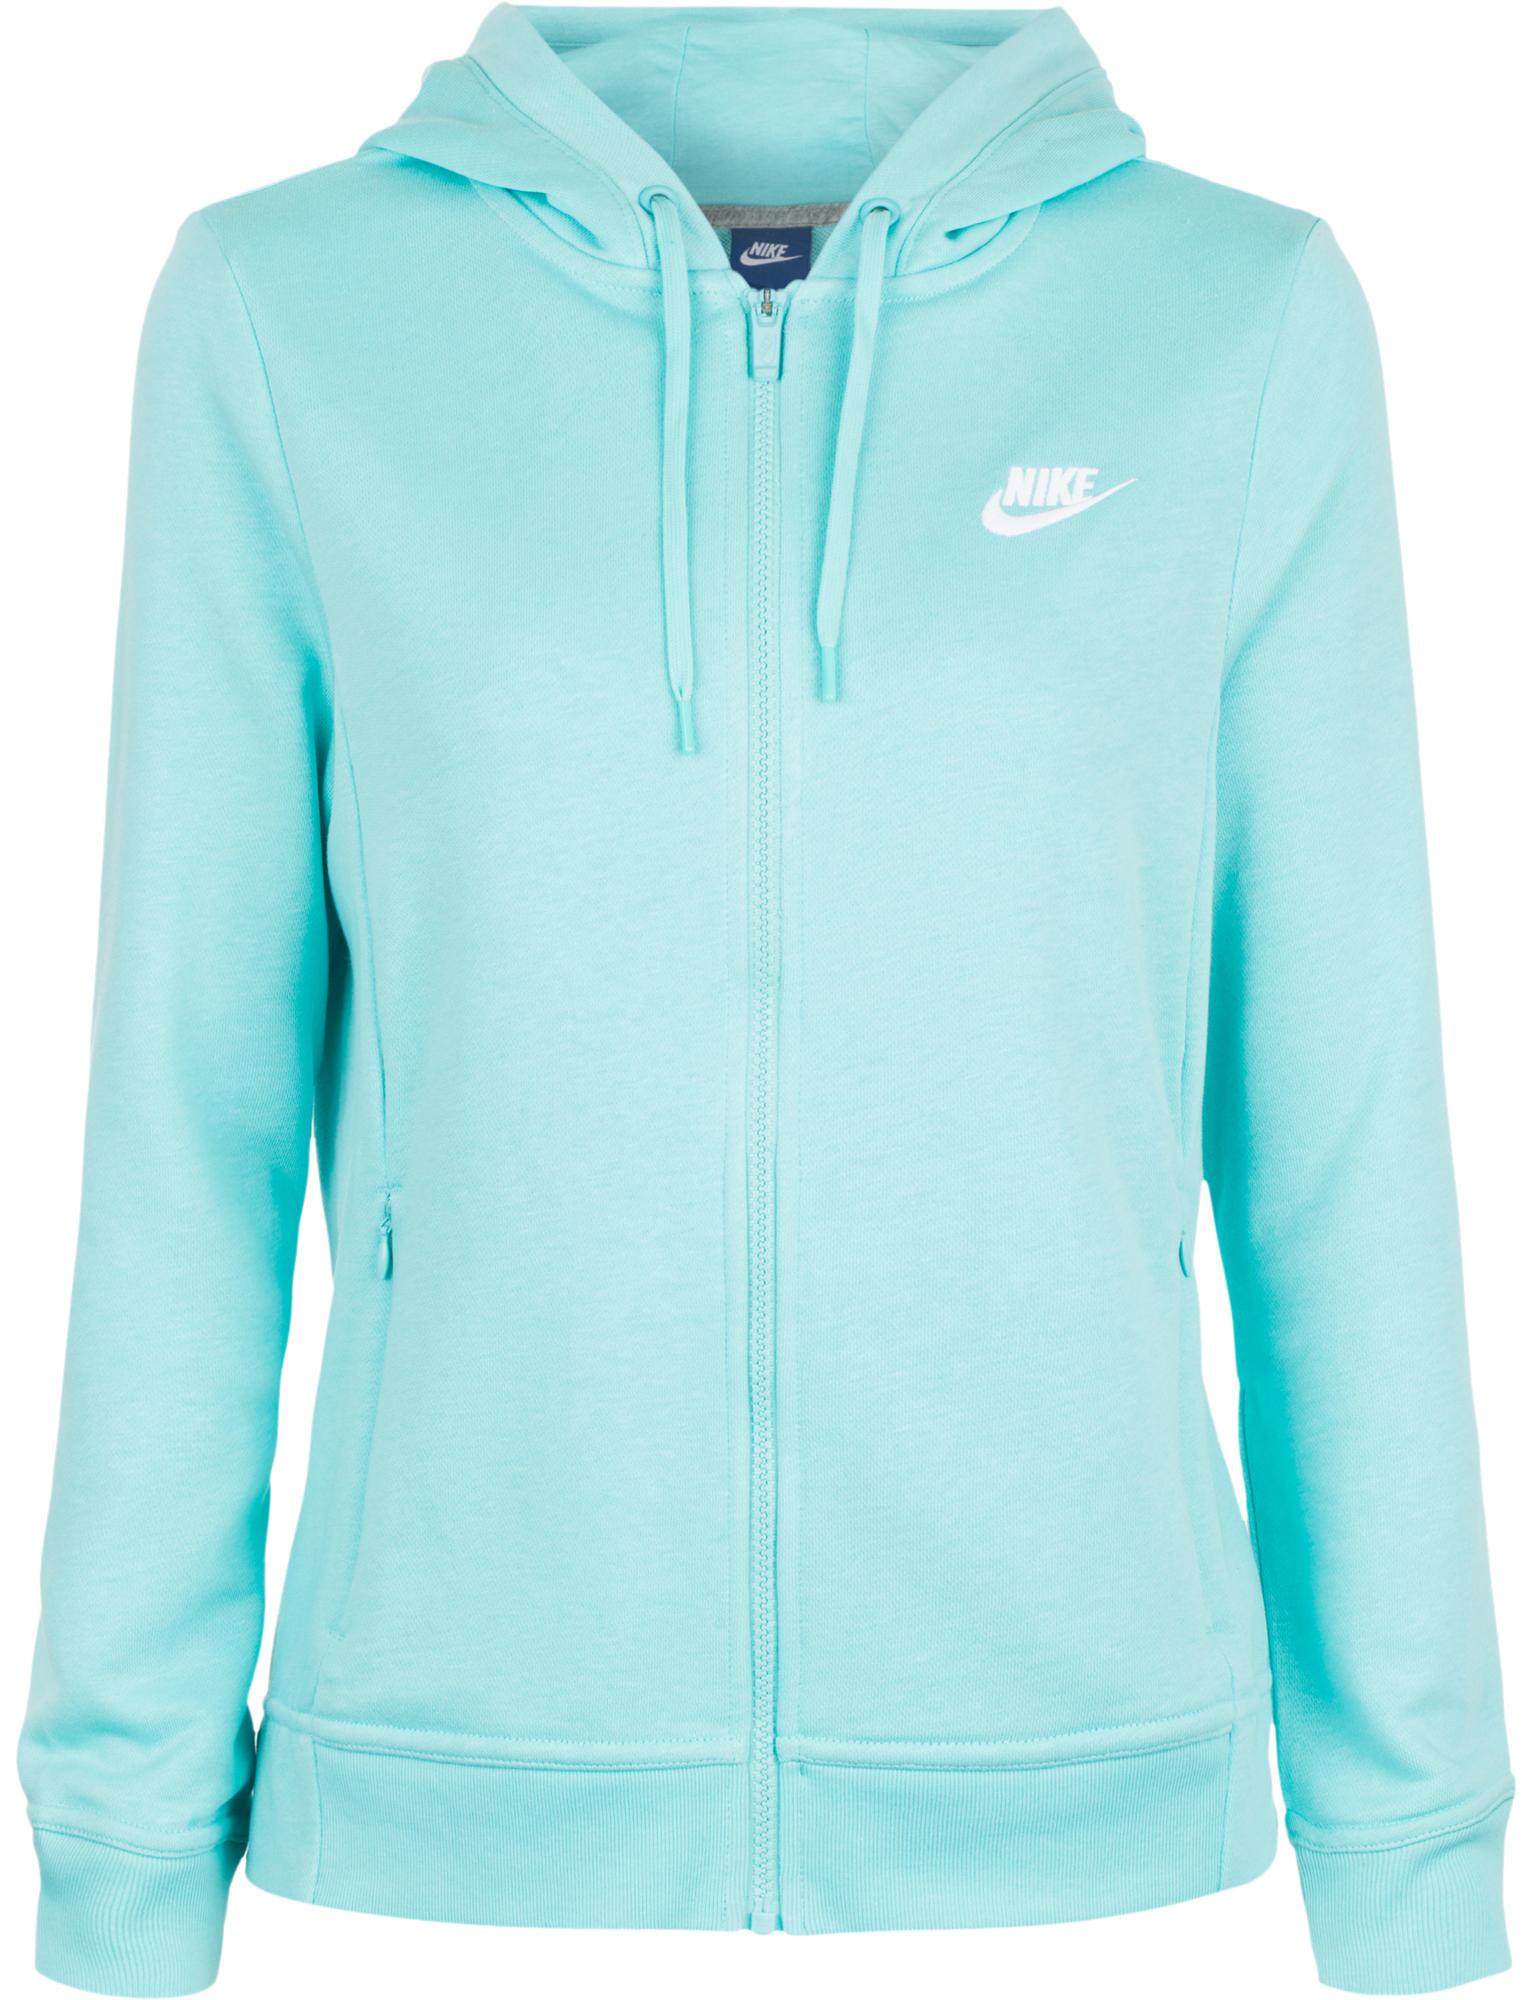 Nike Джемпер женский Nike Sportswear Hoodie nike костюм спортивный женский nike sportswear